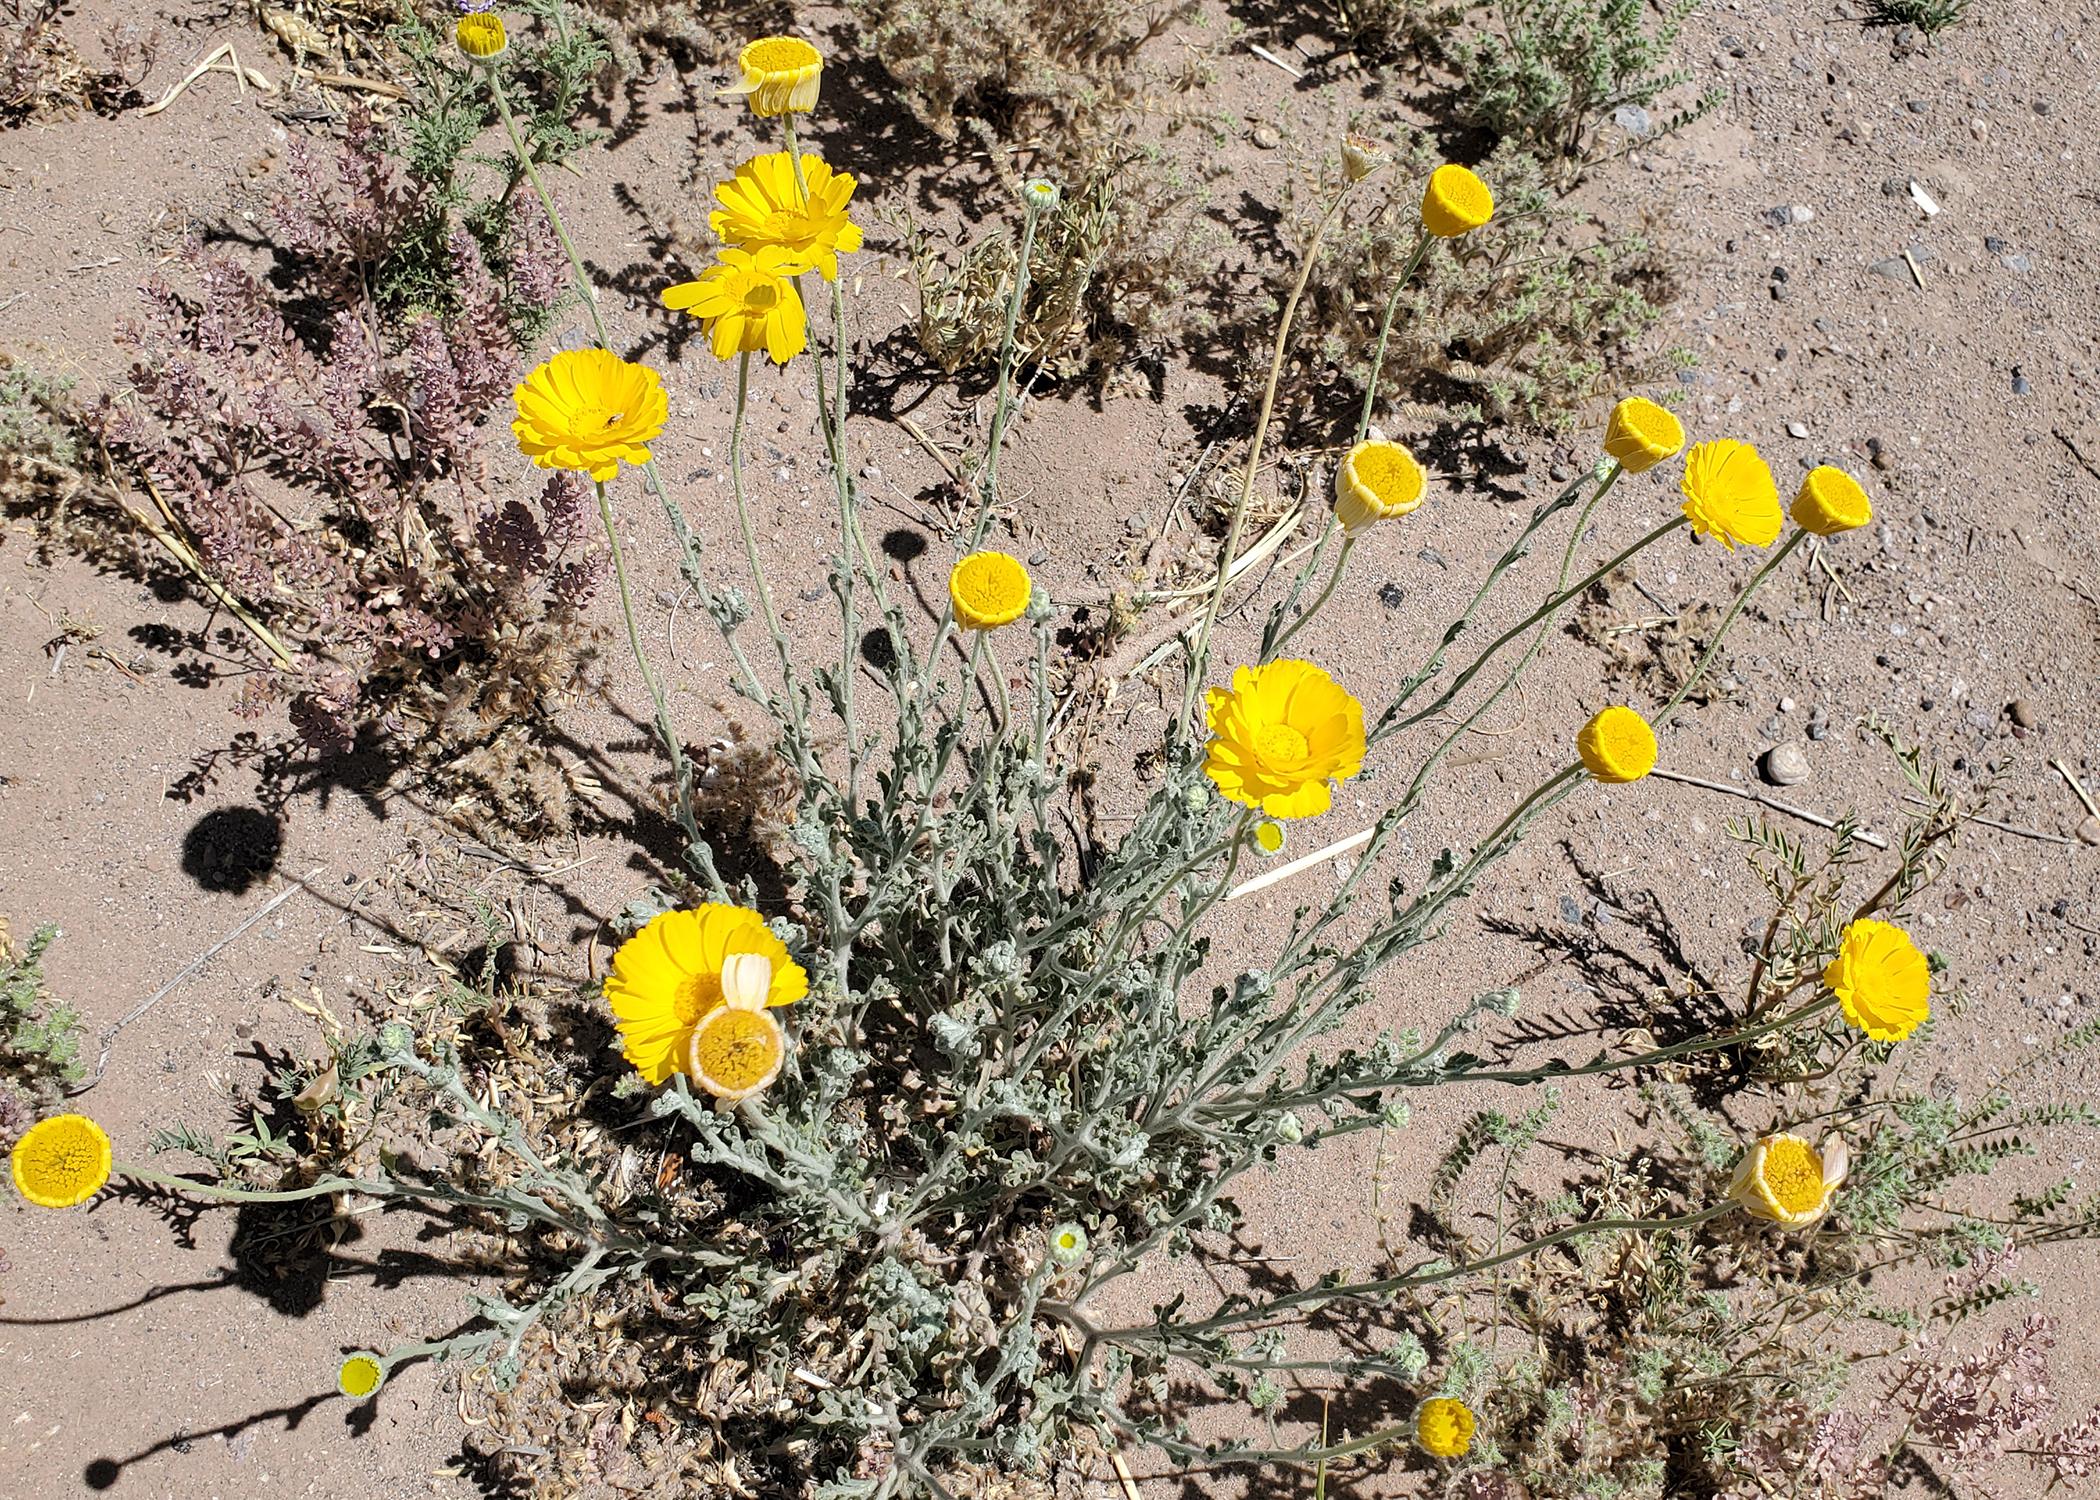 Yellow flowers in the desert.